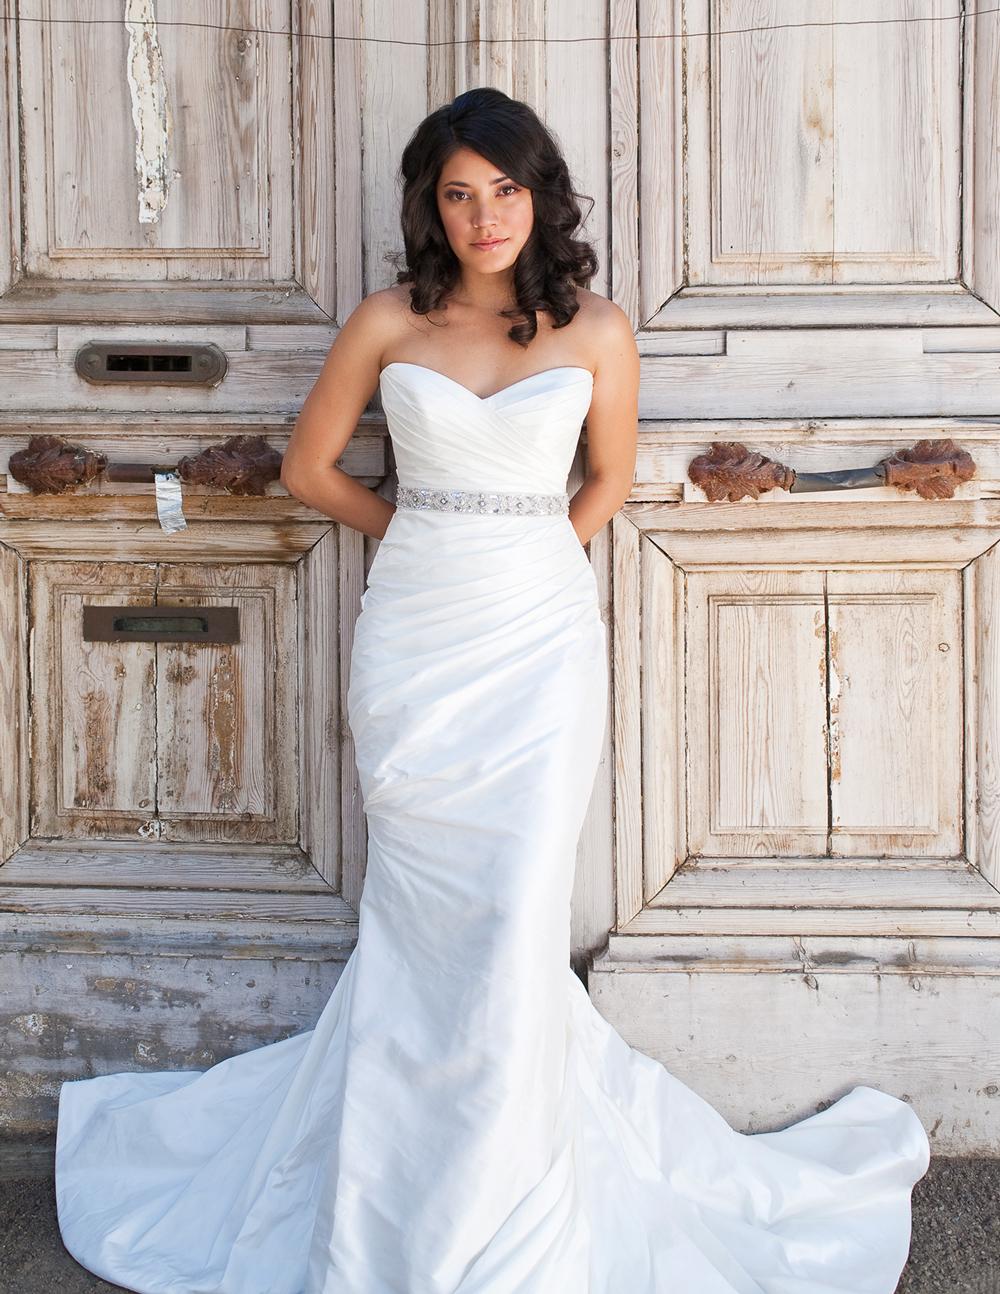 jared-teska-local-photography-wedding-portrait.jpg